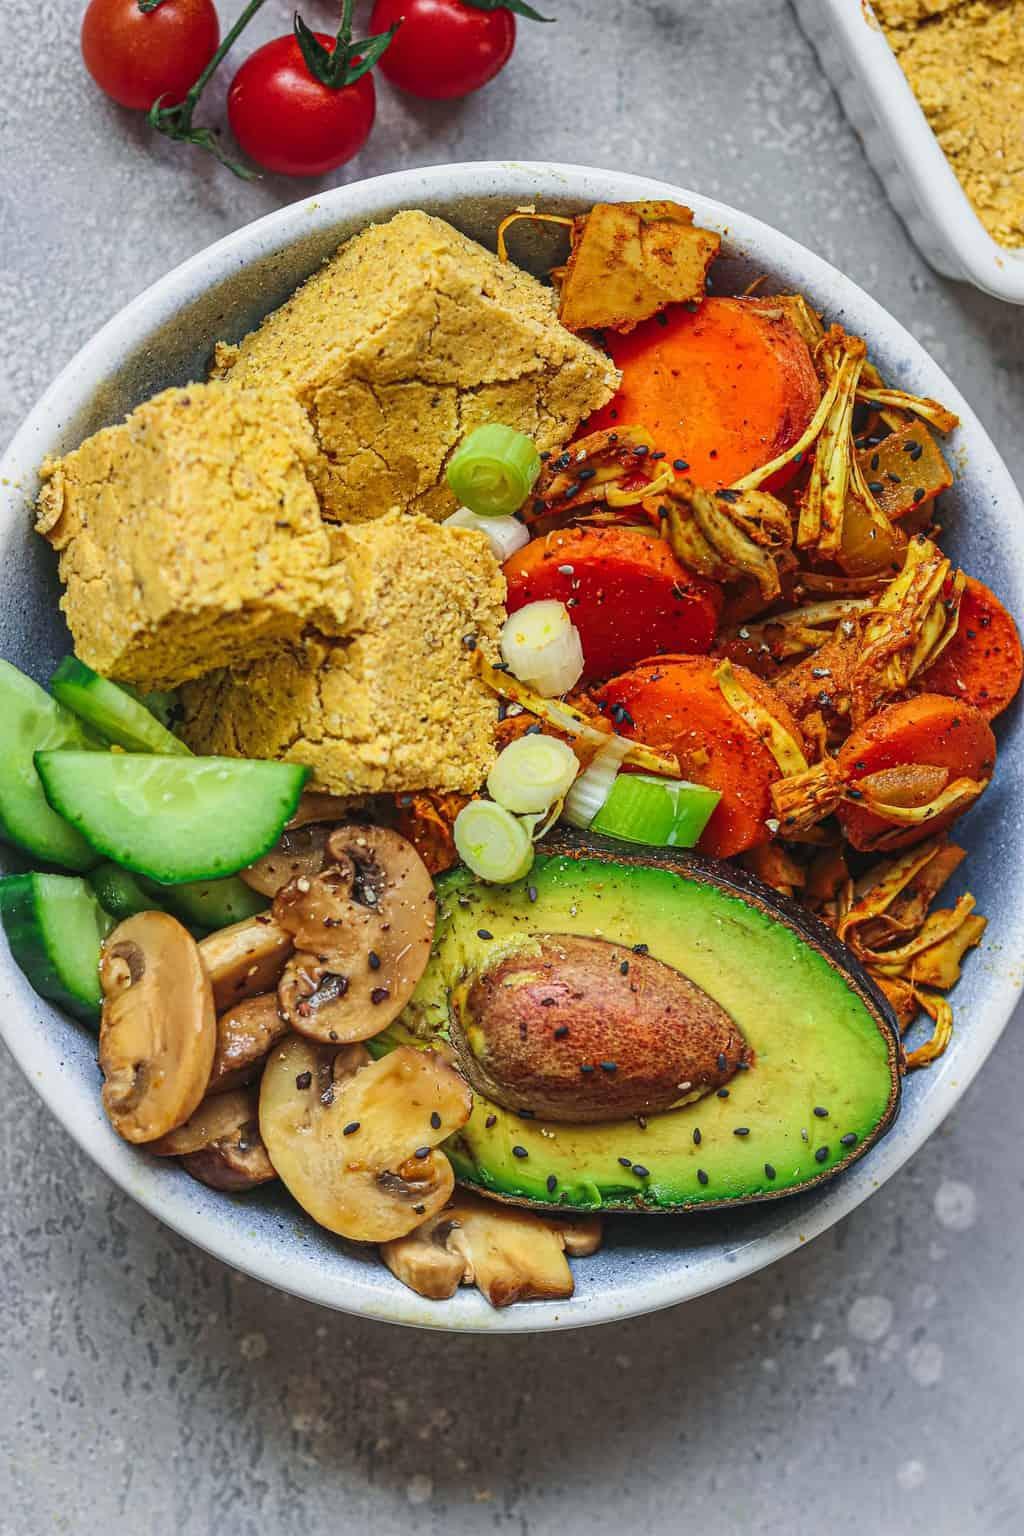 Bowl with cornbread, jackfruit and mushrooms